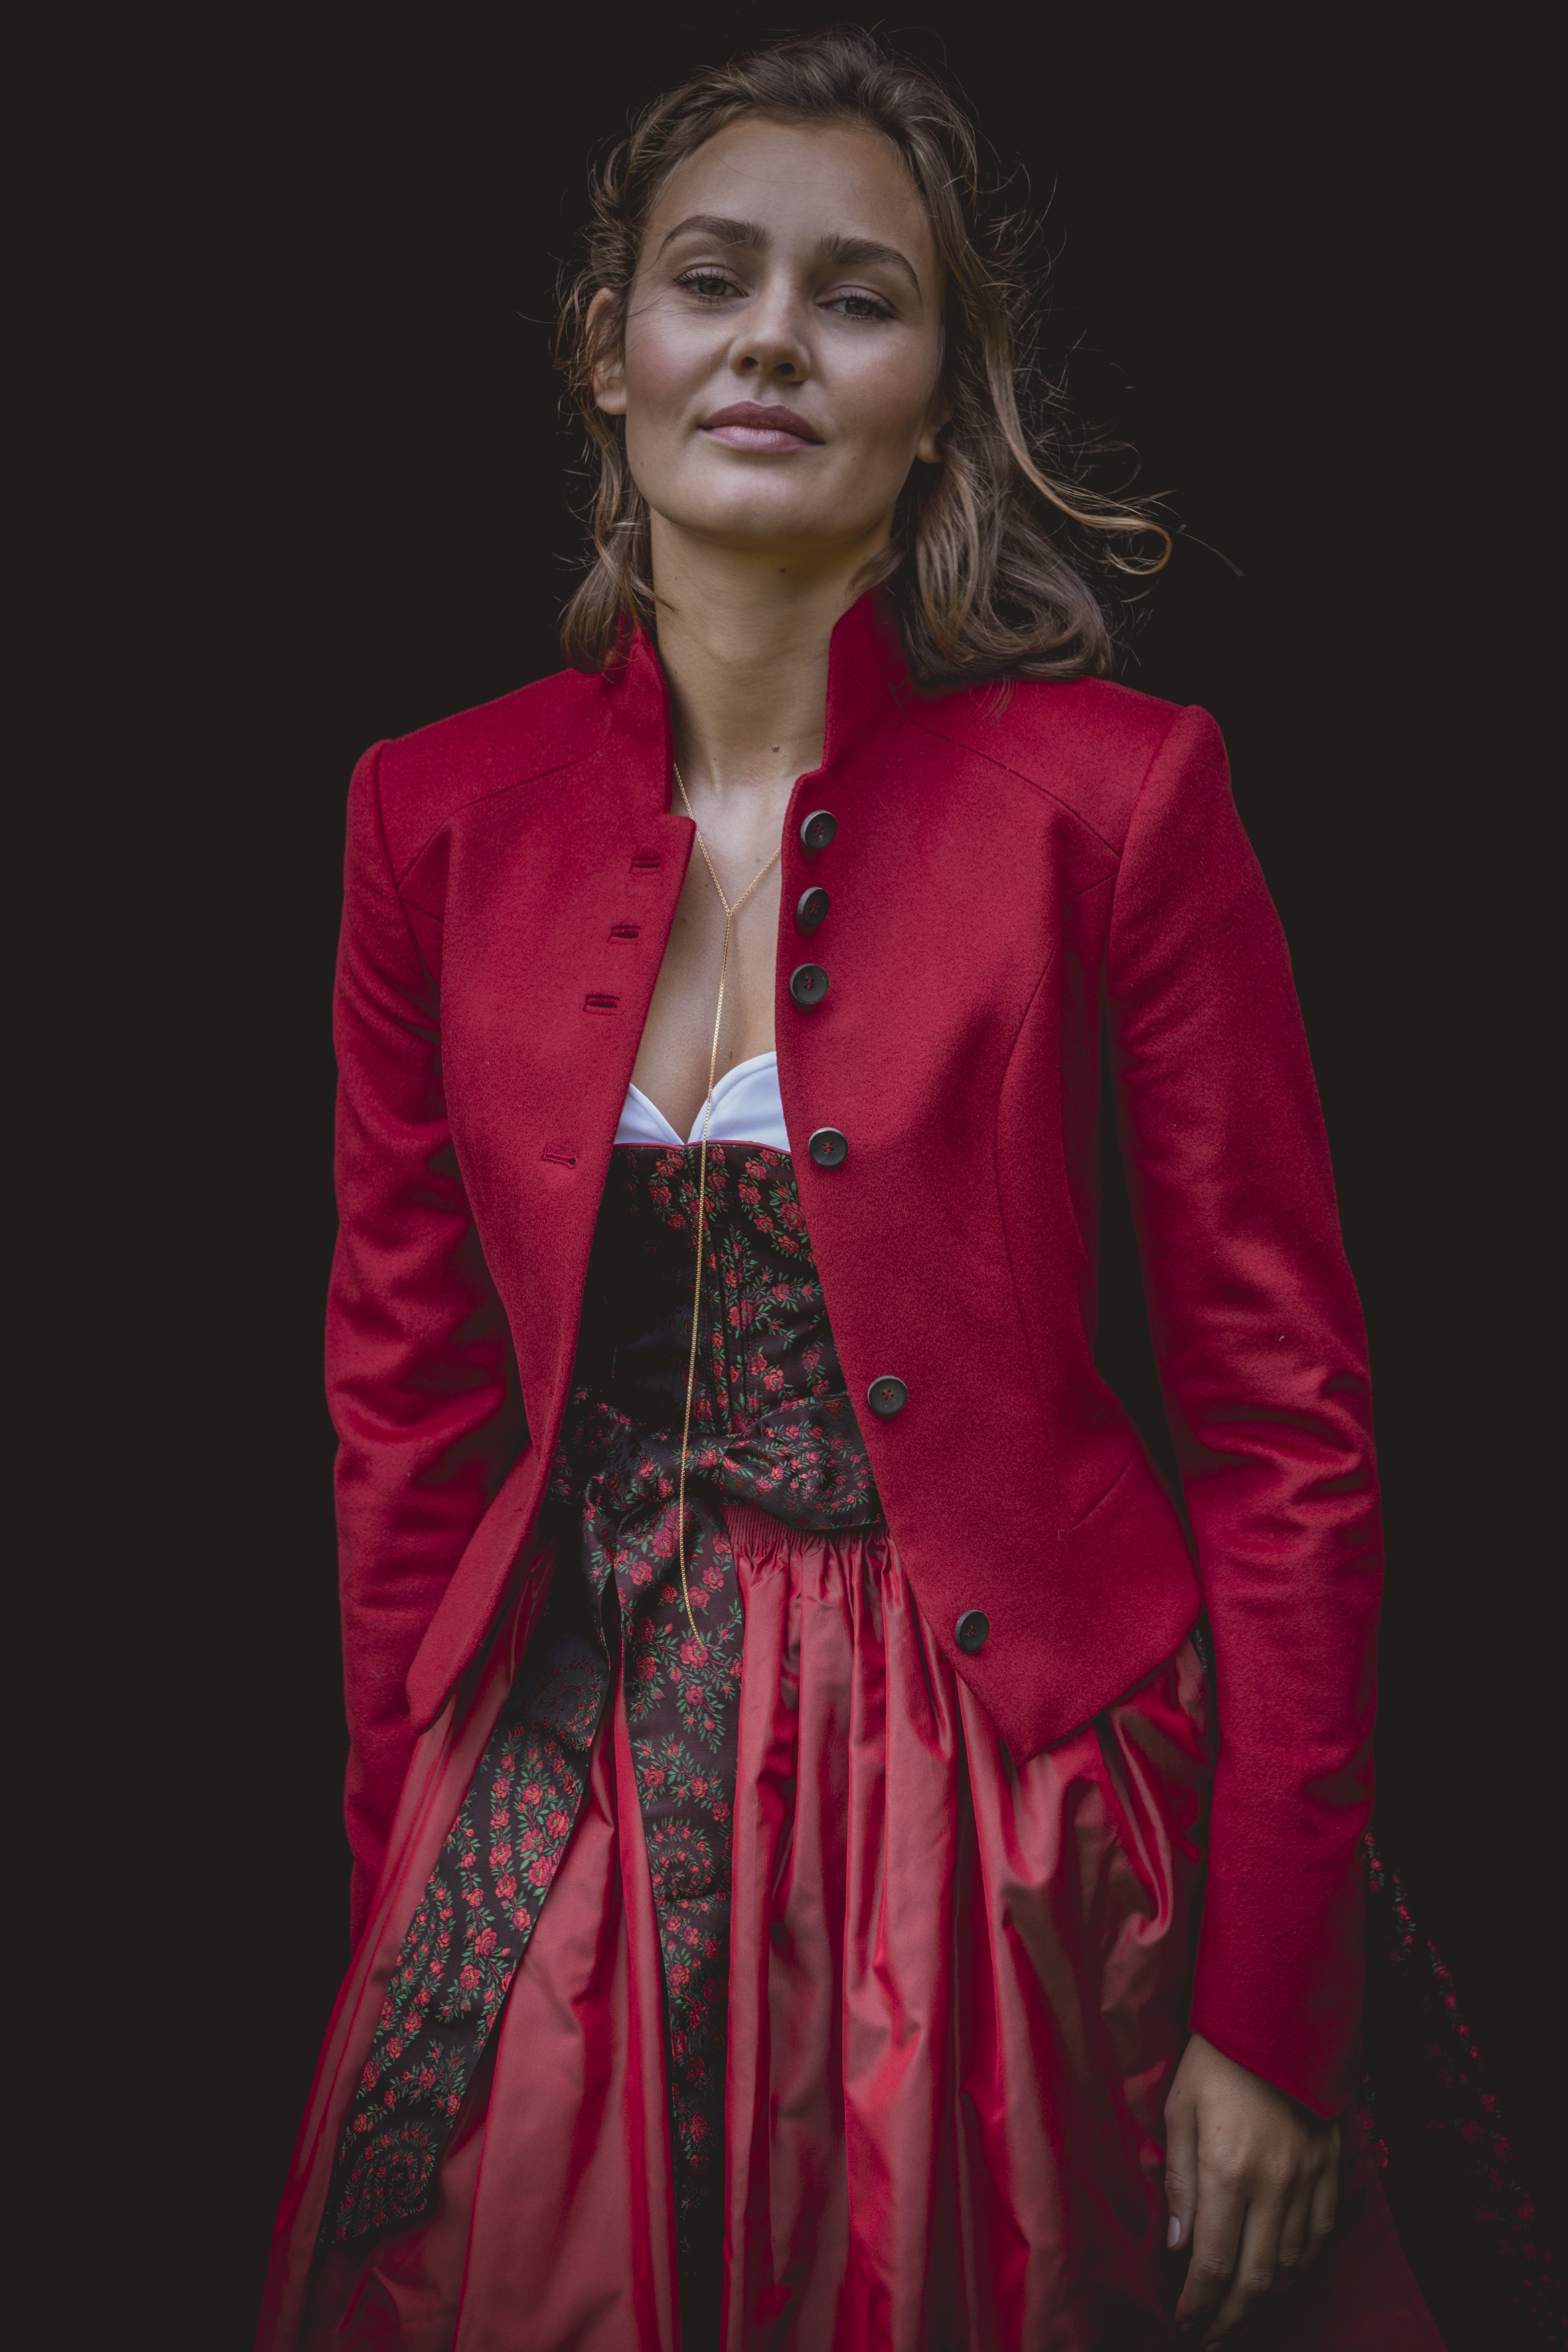 Trachten Greif Hansi Heckmair Luna Elisa Federowicz Visagistin Hair & Make-up Artist